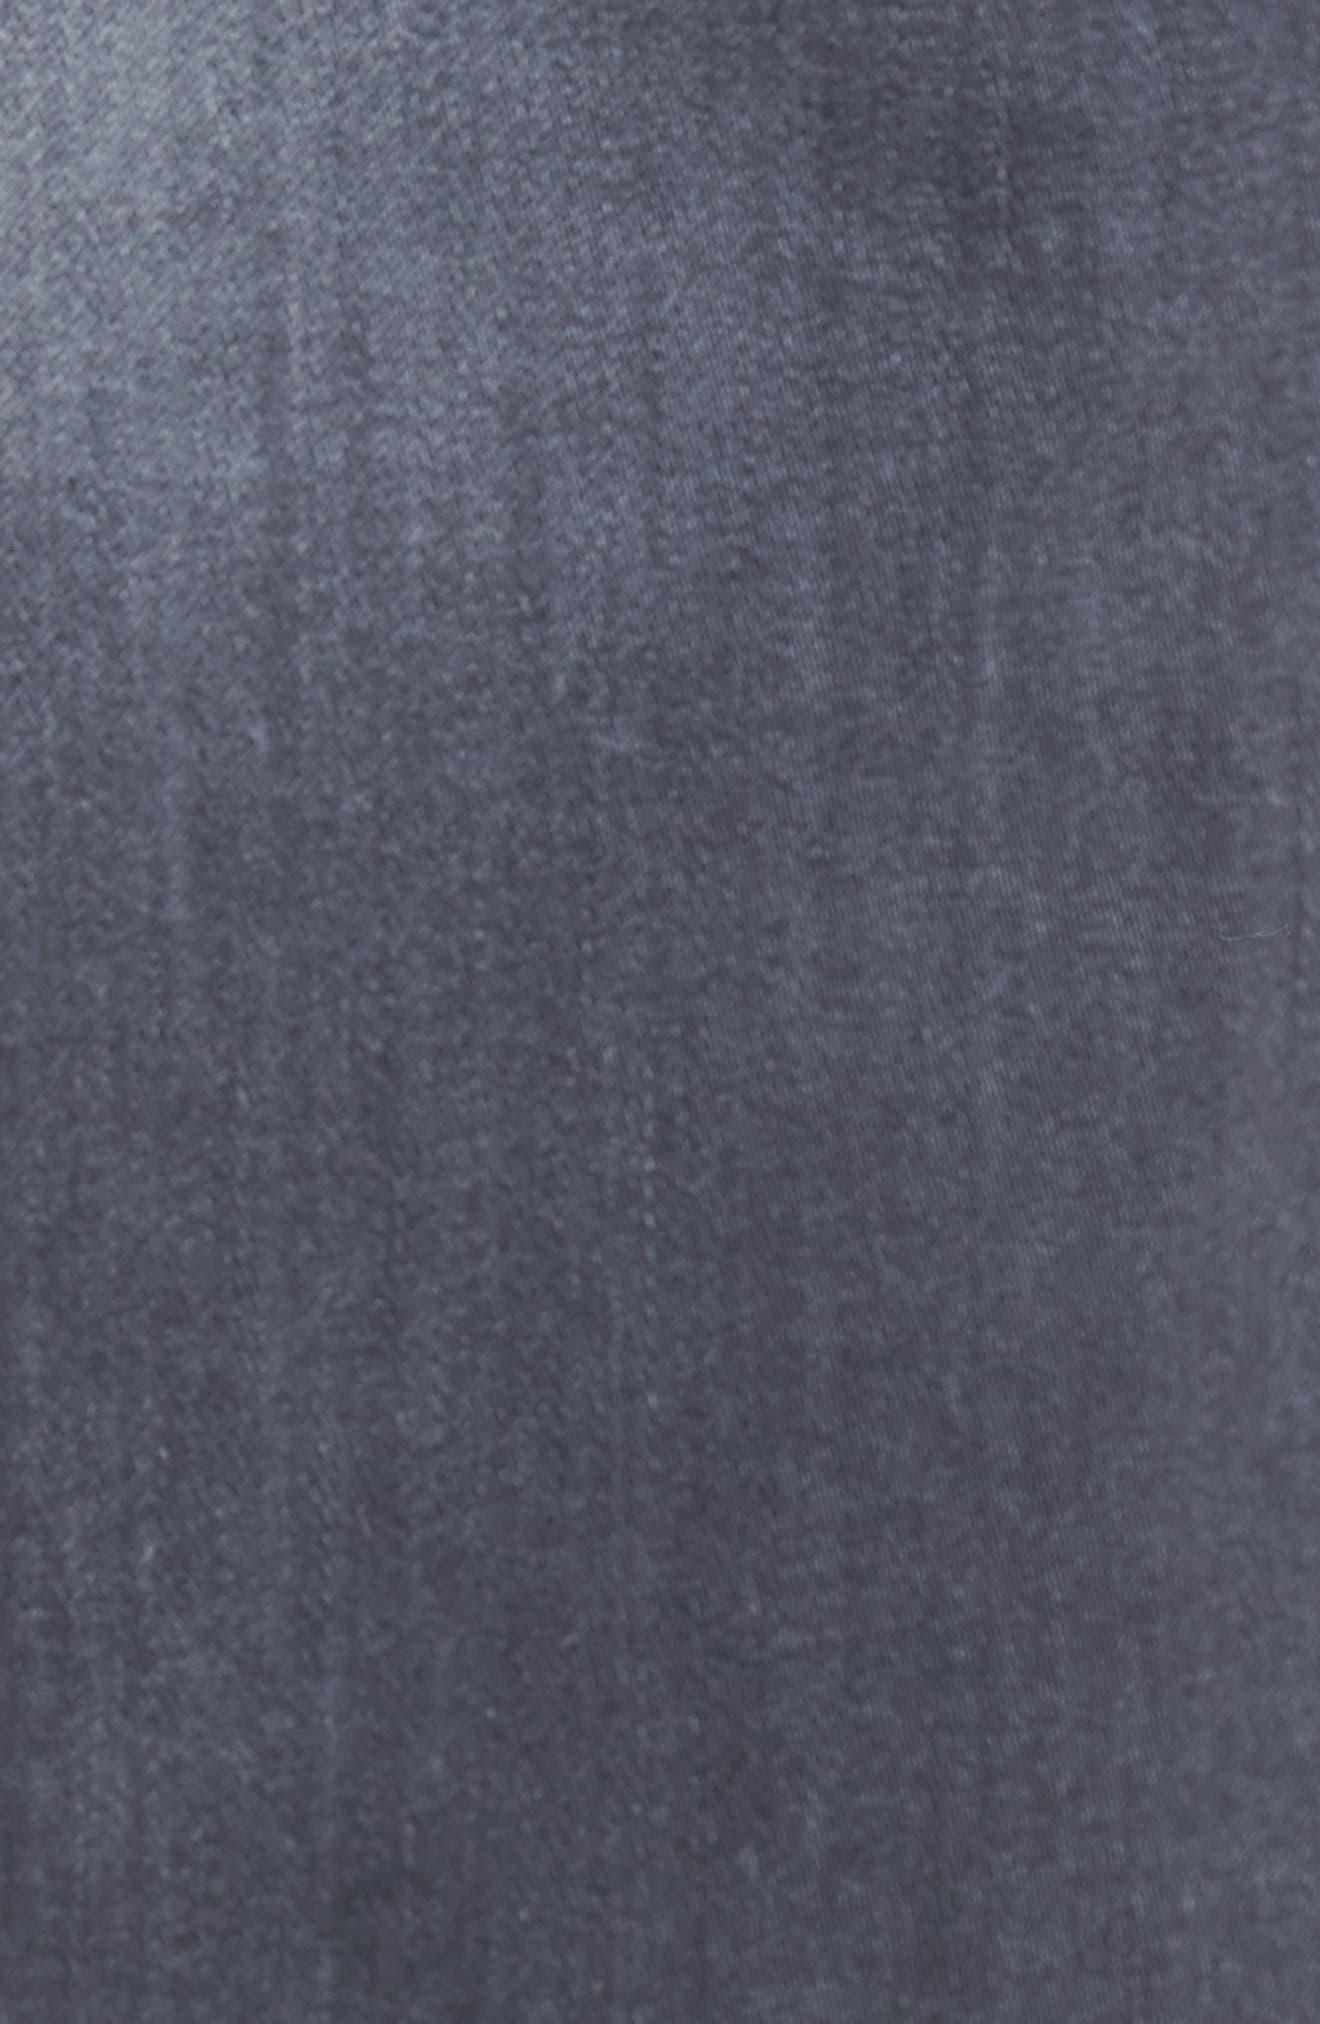 Torino Slim Fit Jeans,                             Alternate thumbnail 5, color,                             020